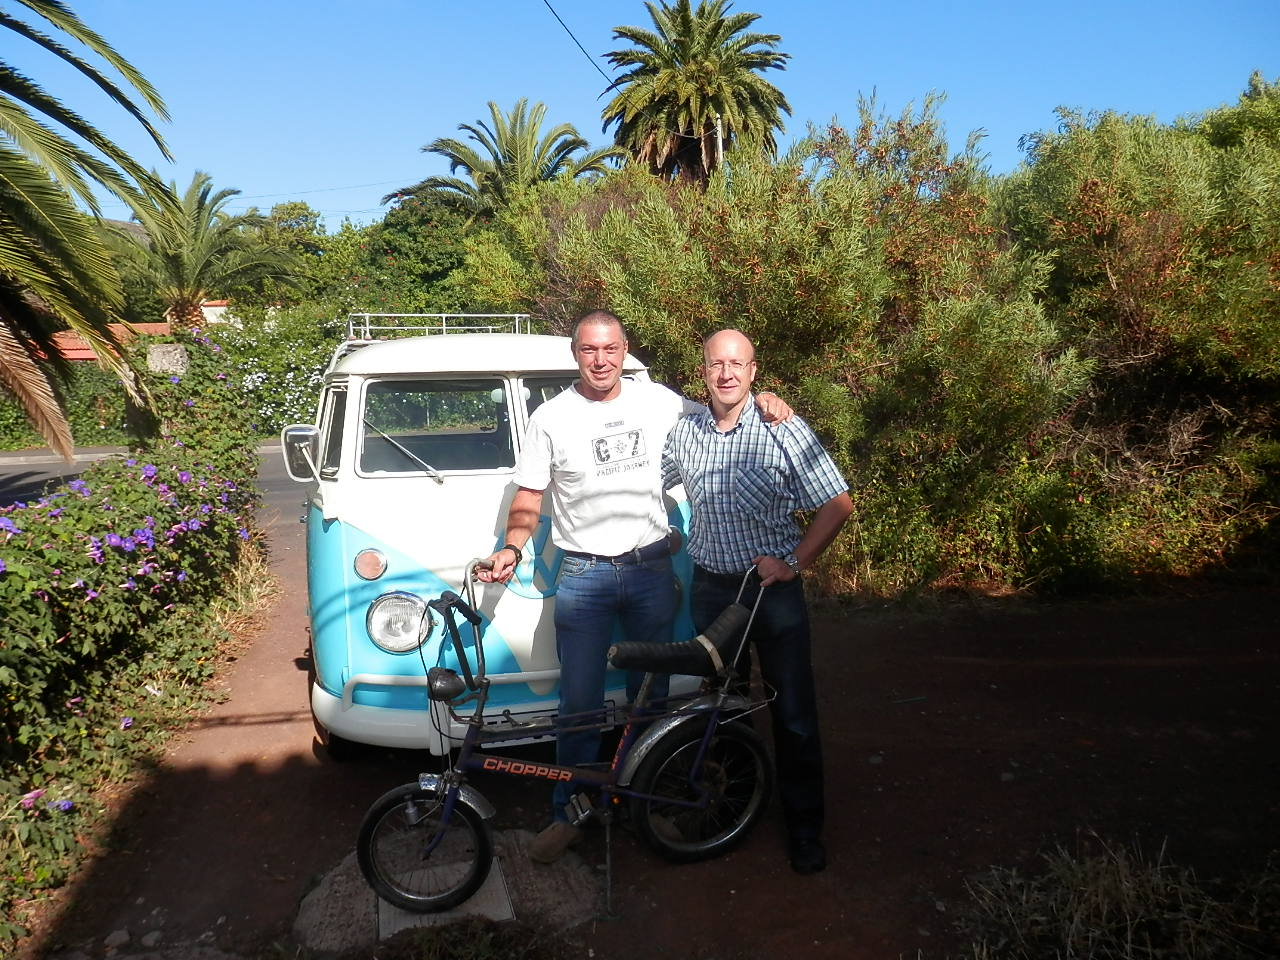 Mi Primera Bicicleta Chicco Su Primera Bicicleta: Eduardo Pérez-Ascanio VW. Tenerife: MI PRIMERA BICICLETA